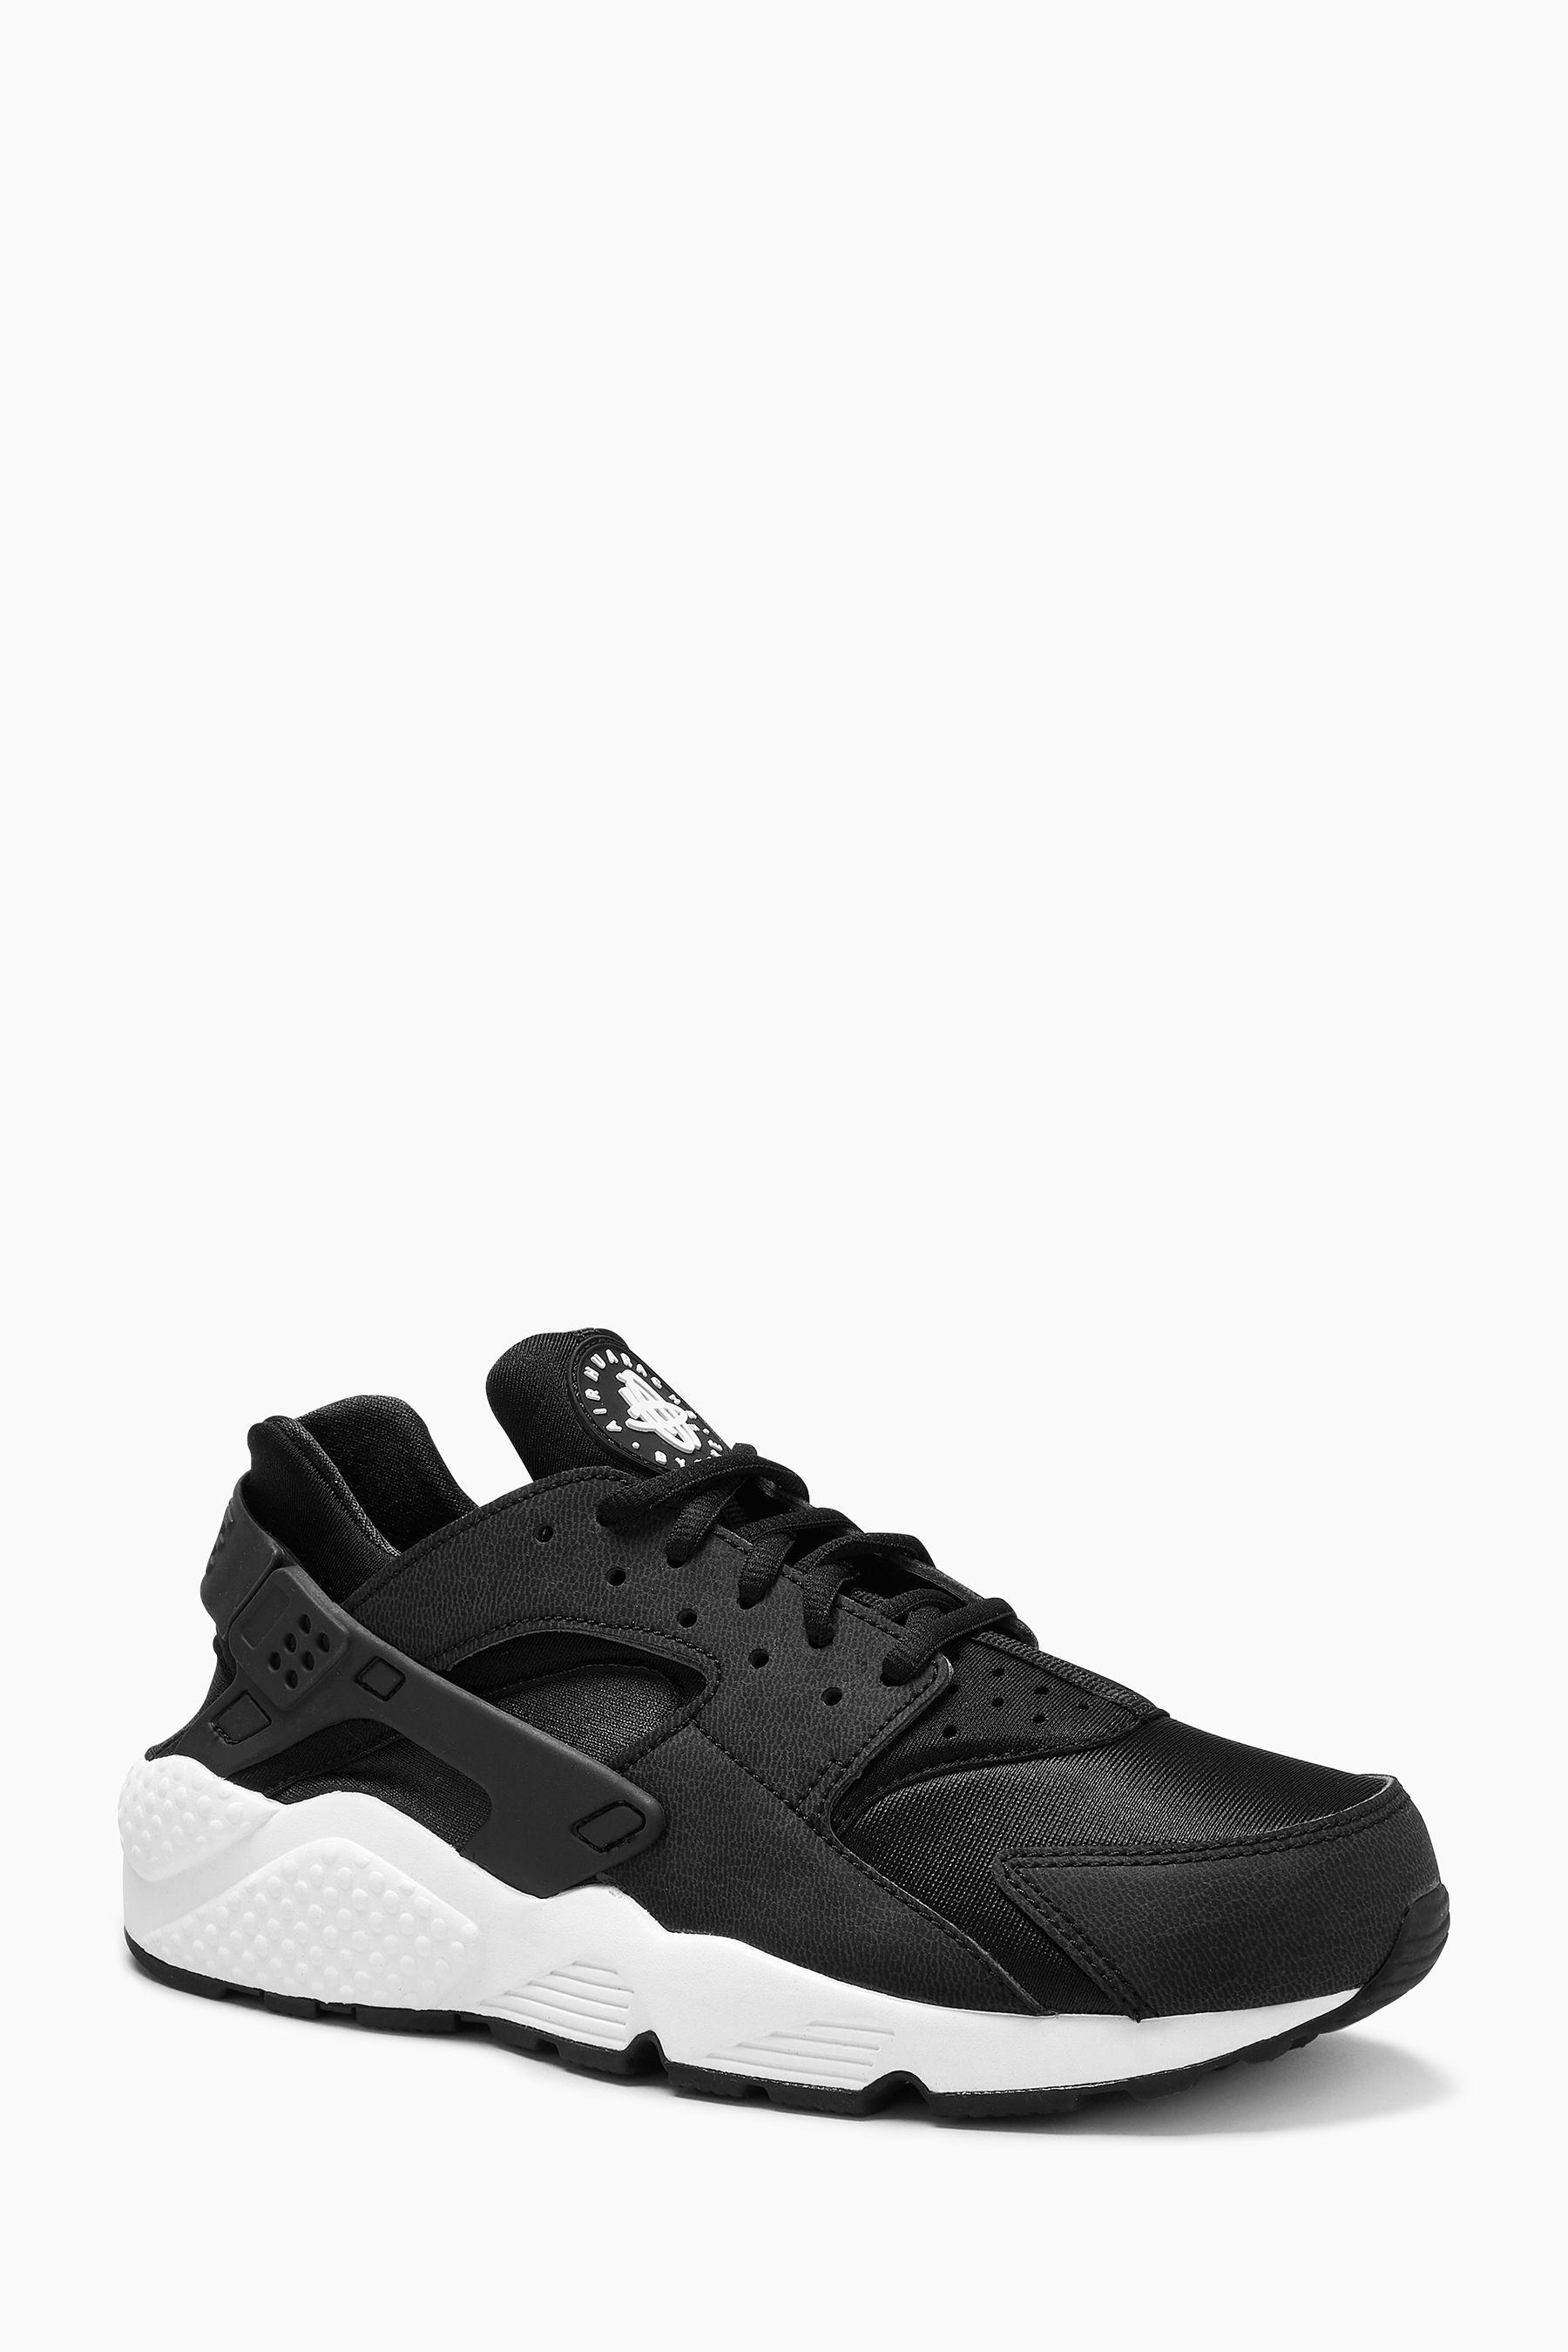 Womens Nike Huarache Run - Black